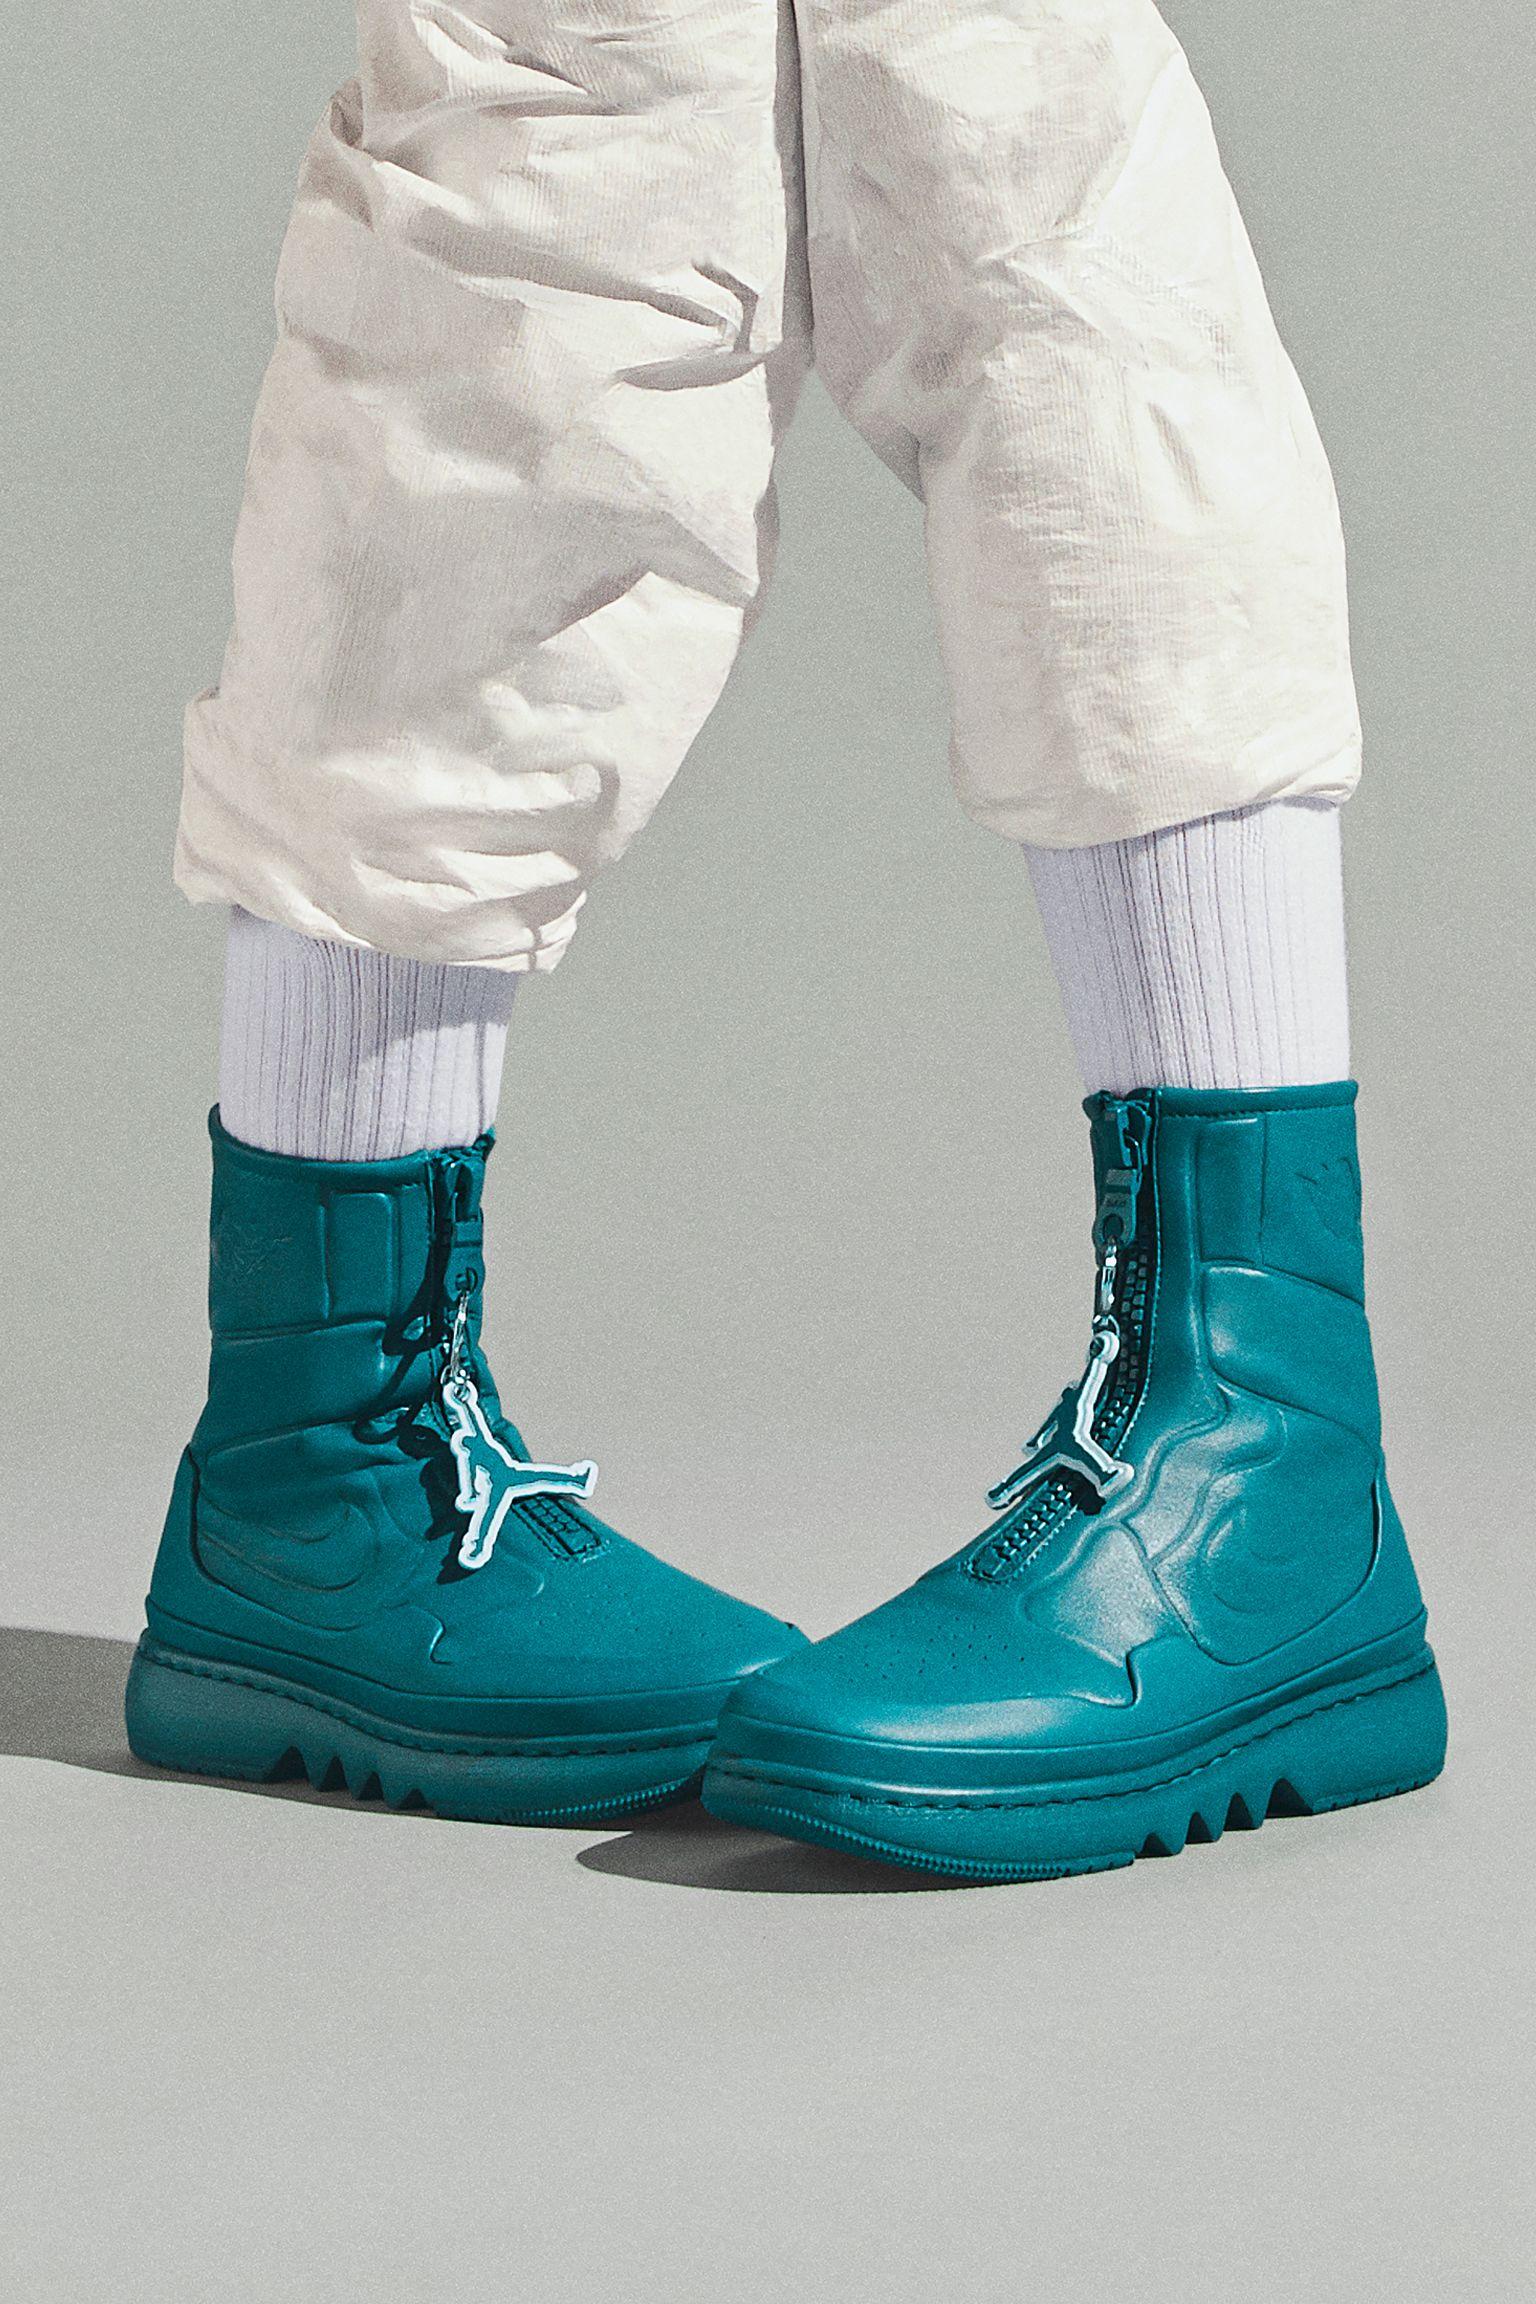 new concept ba6aa eed5c teal Air XX Jordan Jester geode teal geode Nike 1 WzTWp0rR